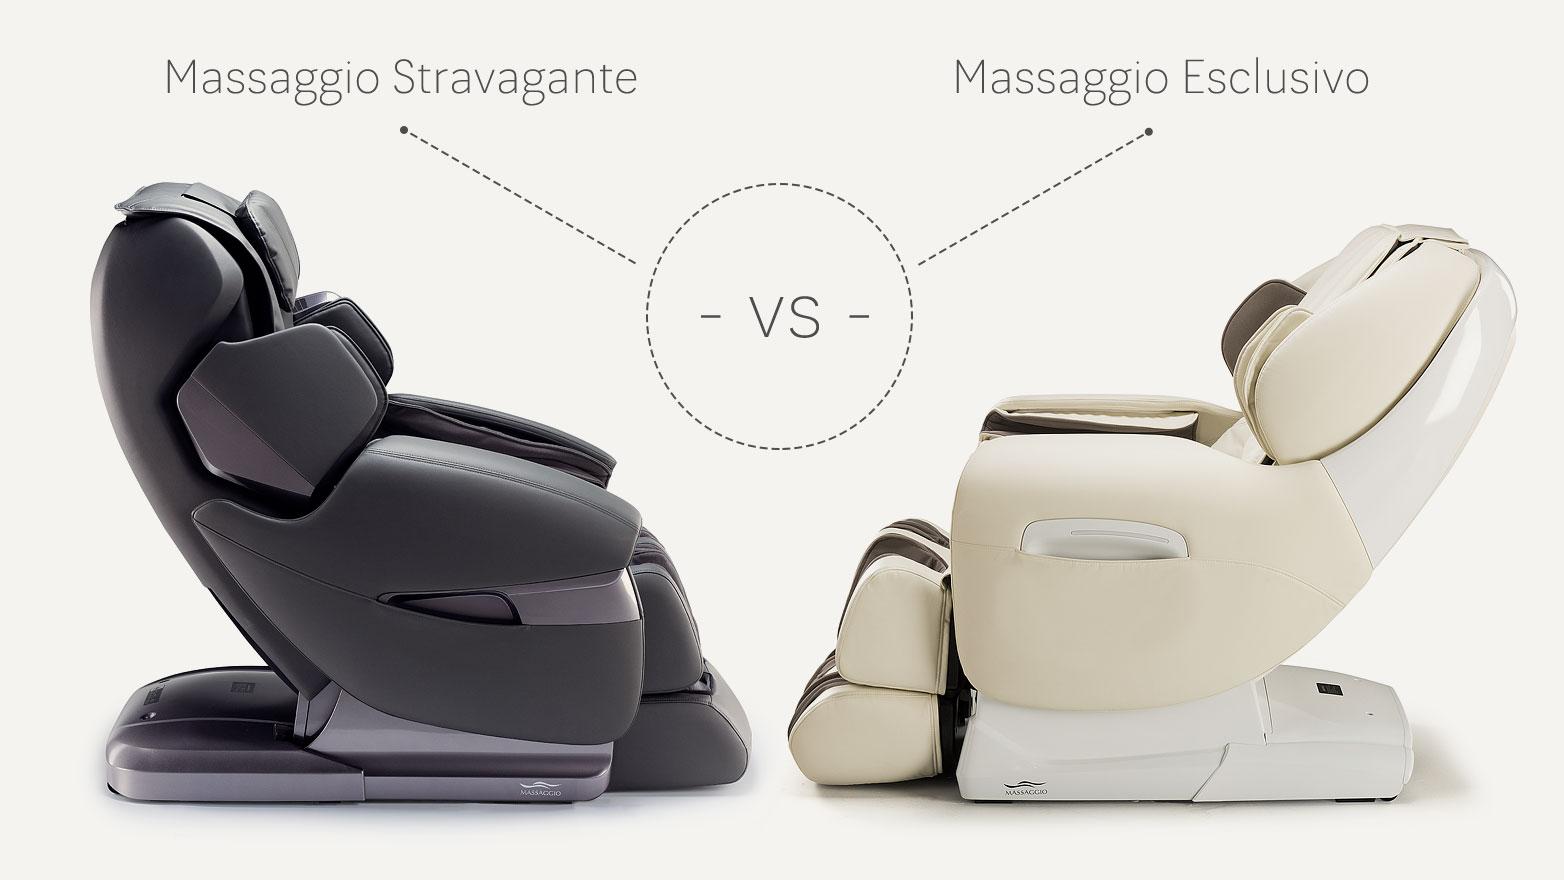 Fotele masujące Massaggio Stravagante vs Esclusivo